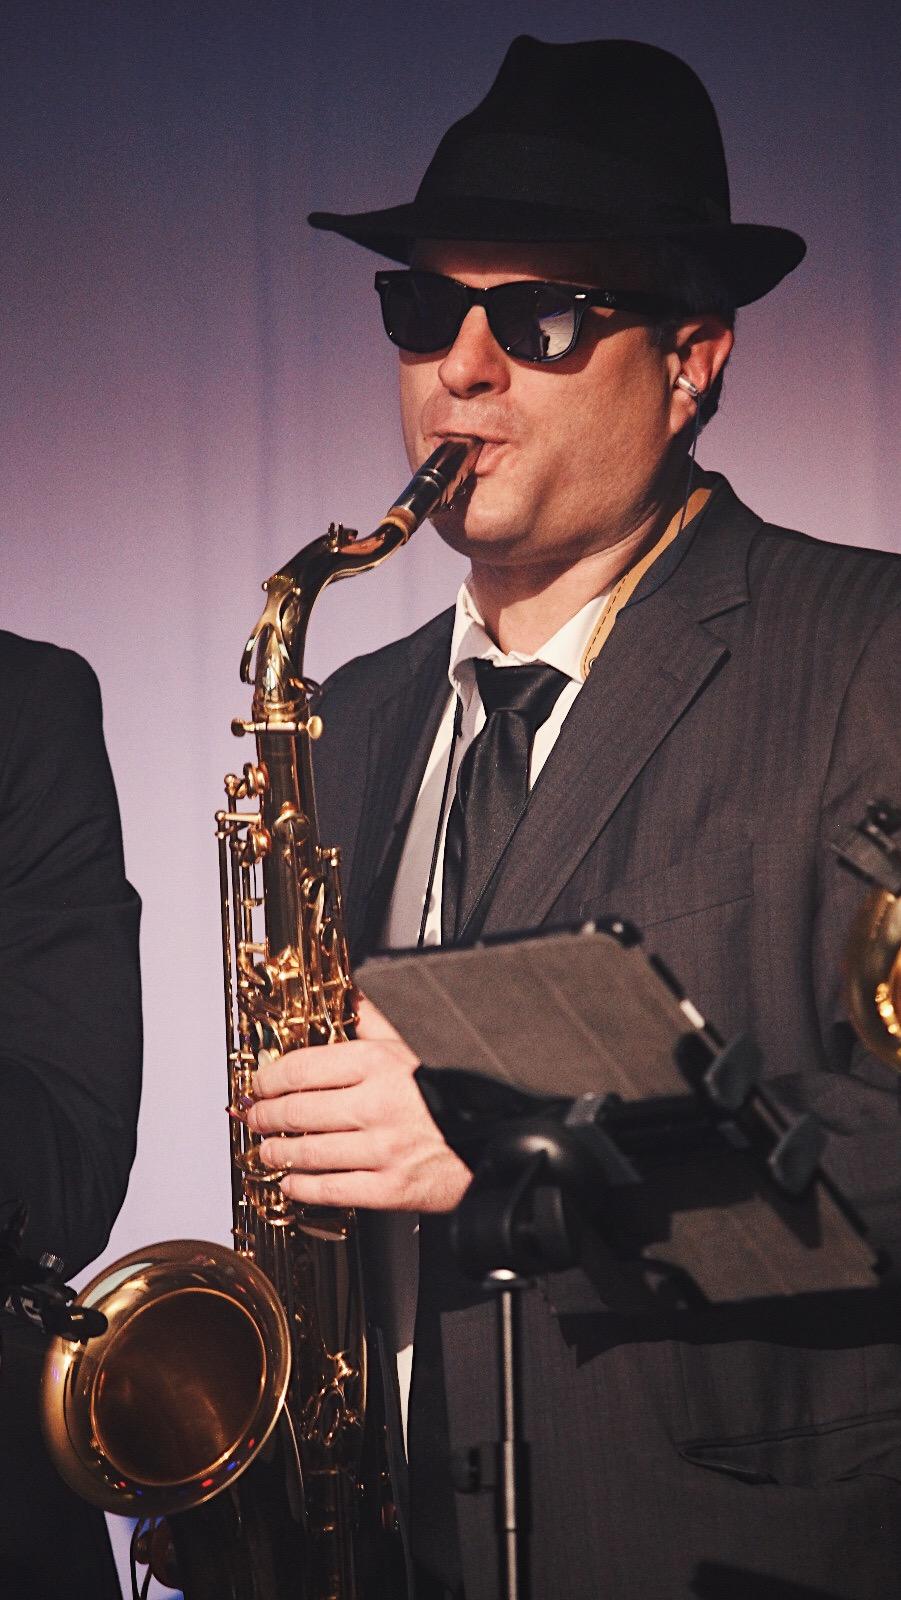 Matthias Meier am Saxophon (Bildrechte: Sabine Köstlmaier)